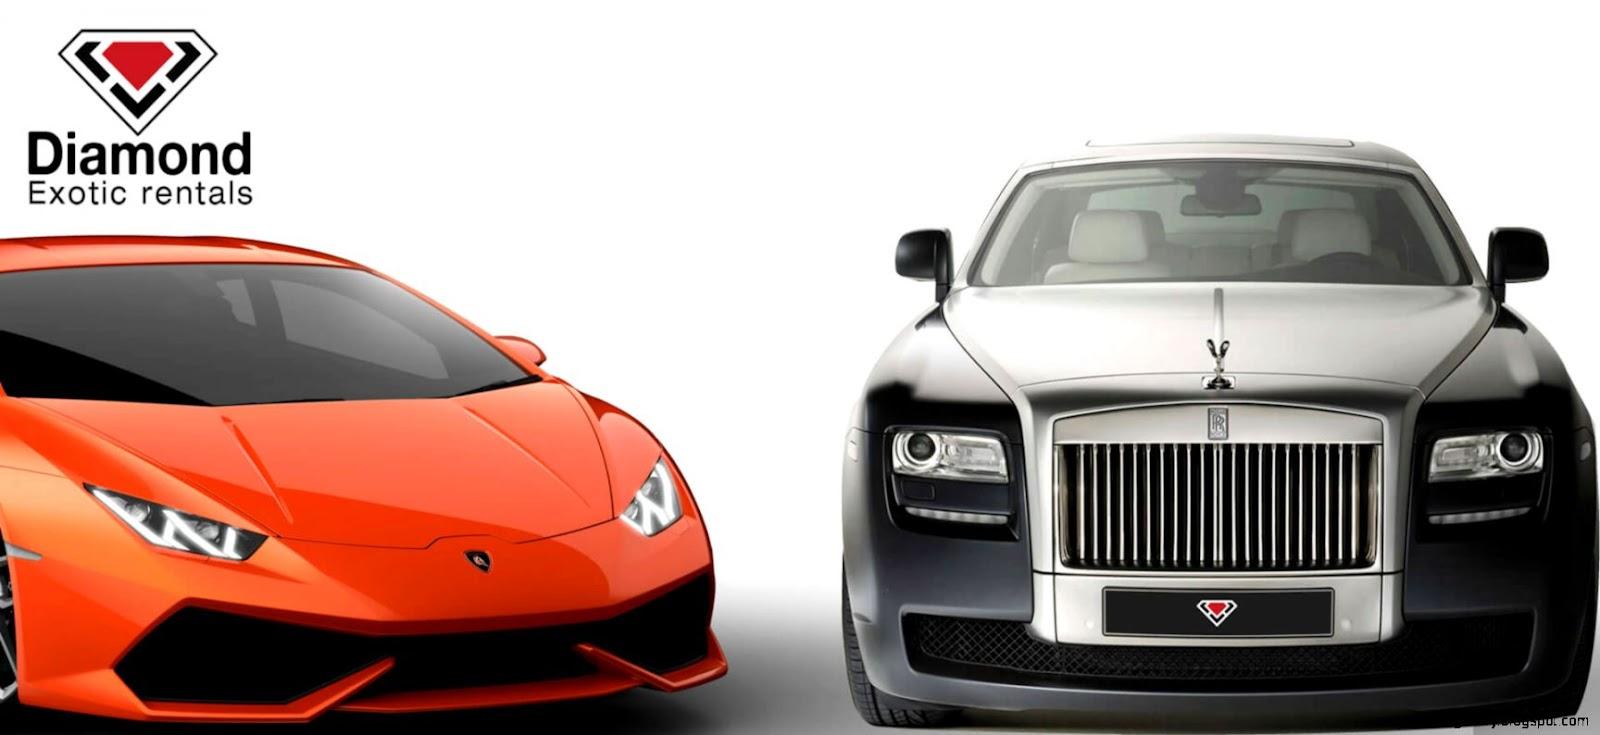 Diamond exotic rentals – Exotic and Luxury Car Rentals – Luxury